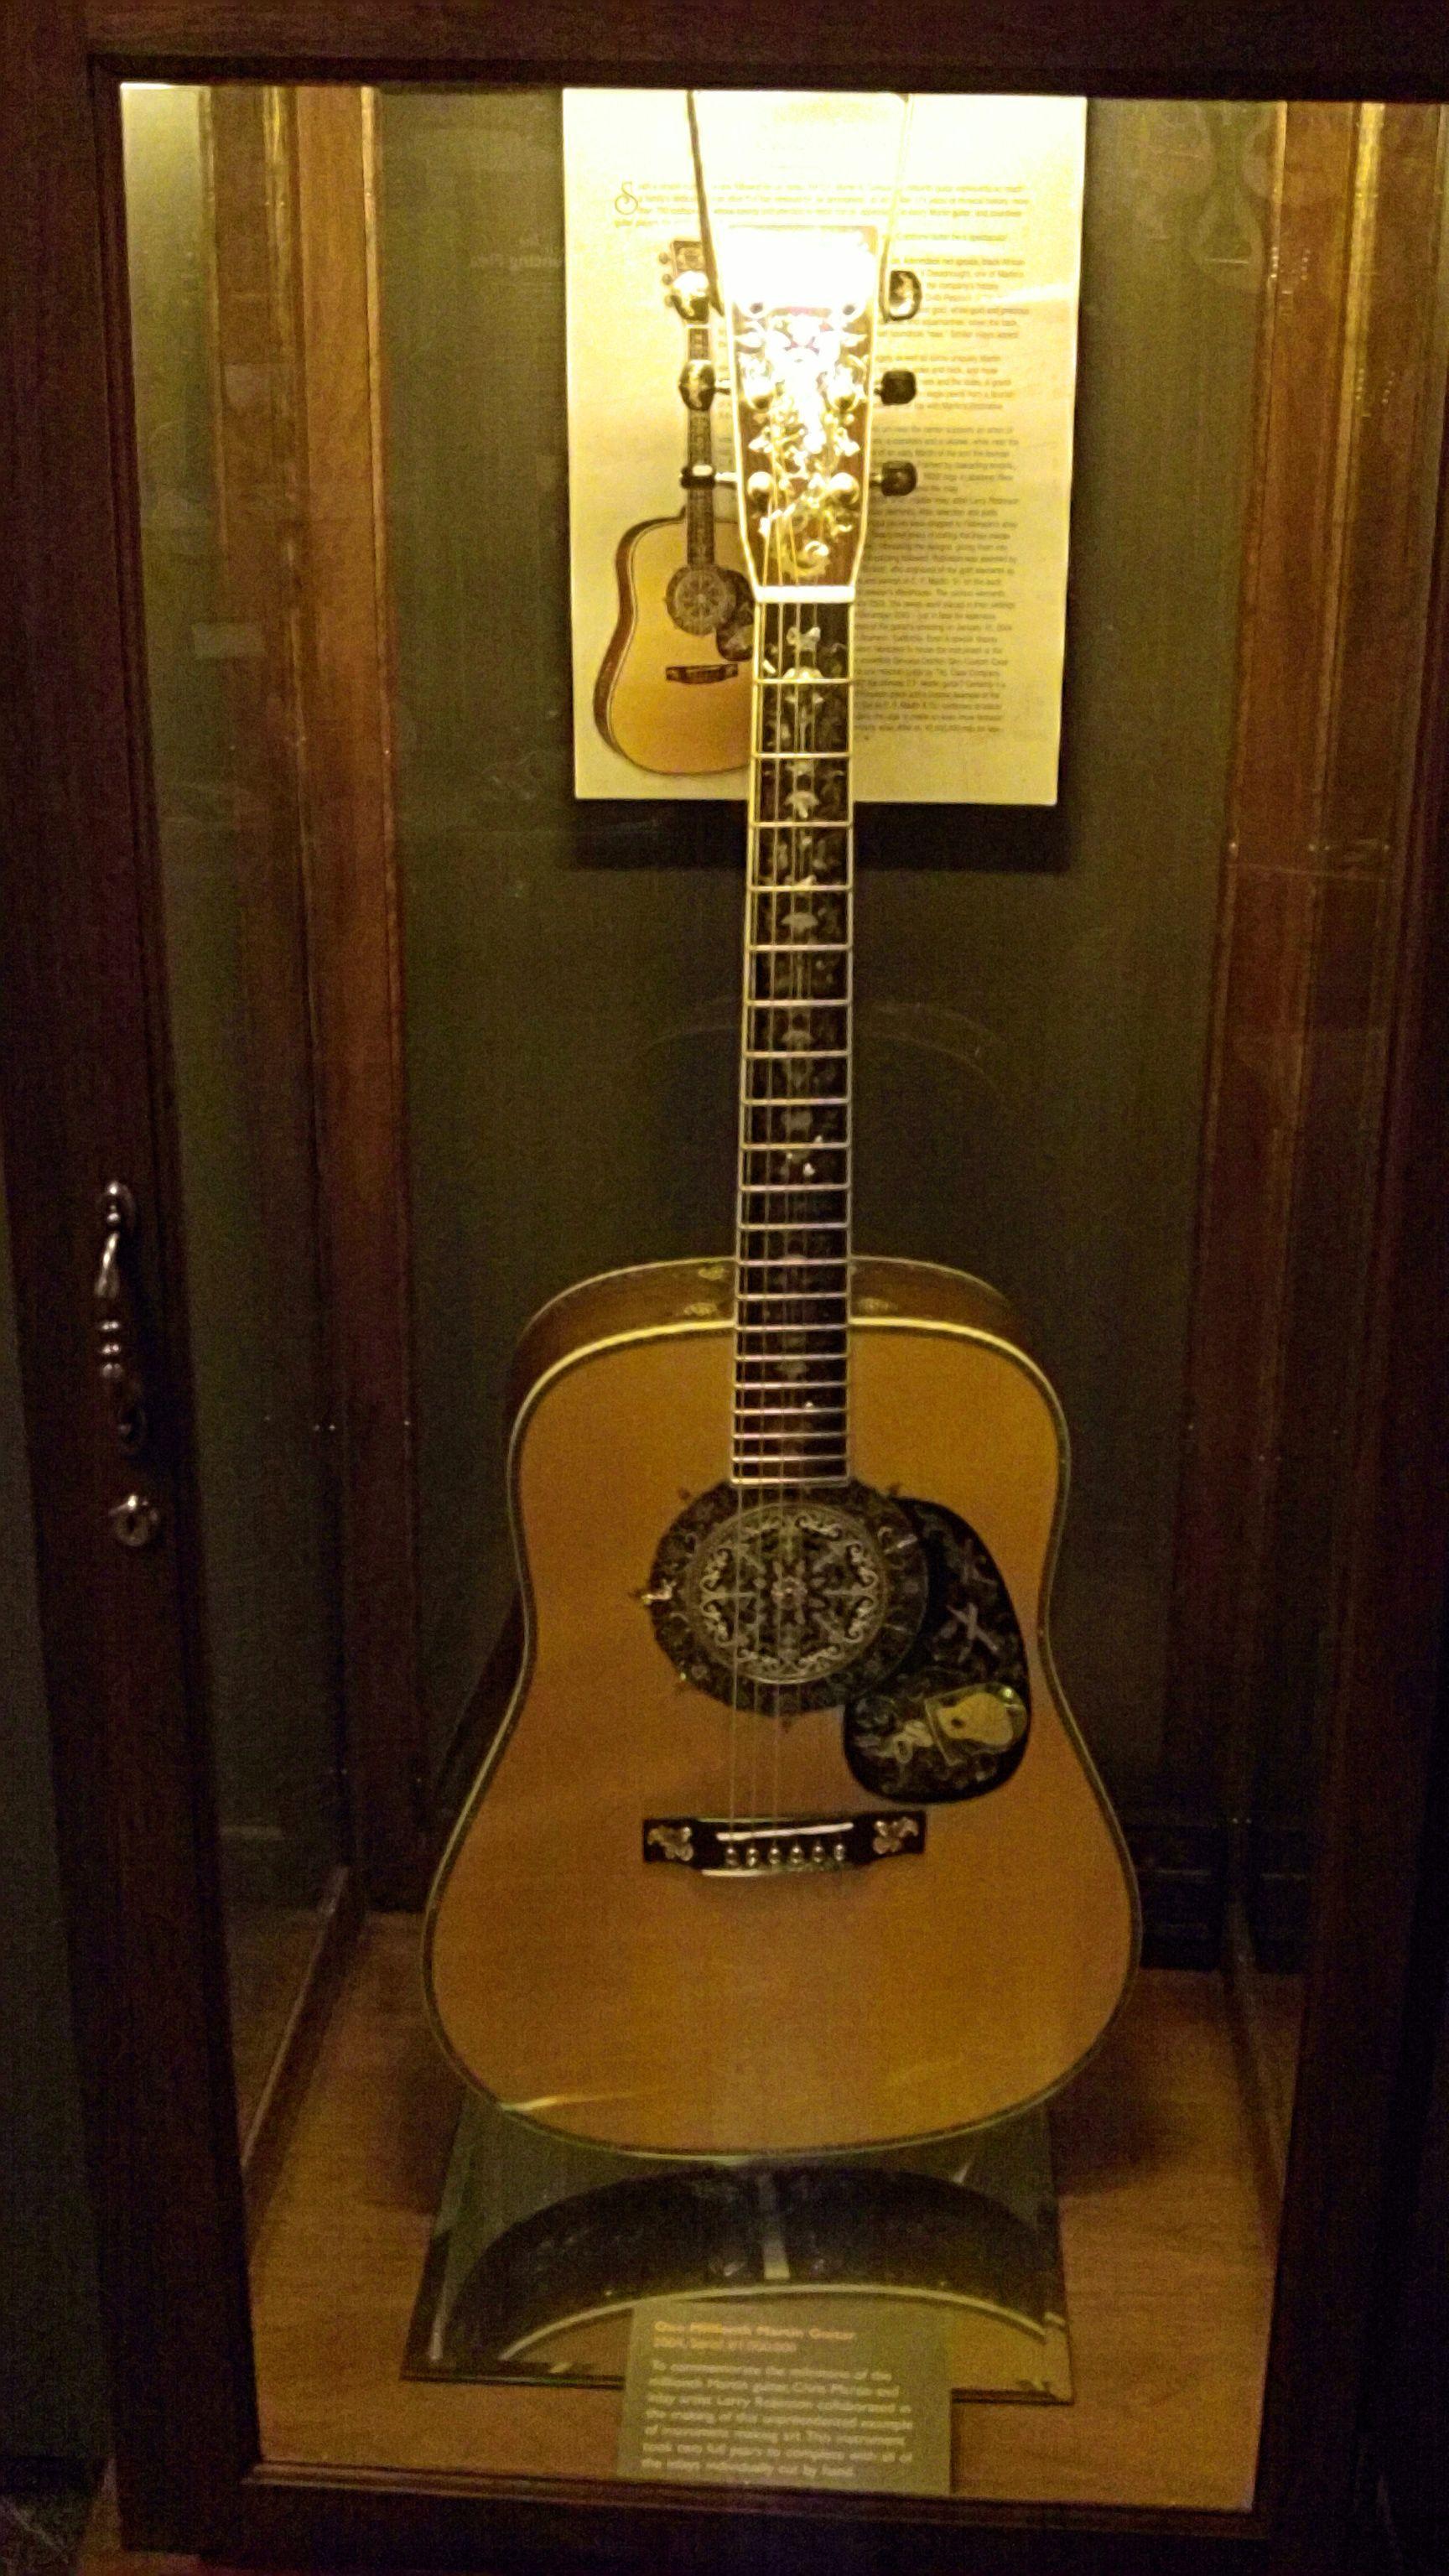 Martin Guitar Number 1 Million - front view   Martin Guitar